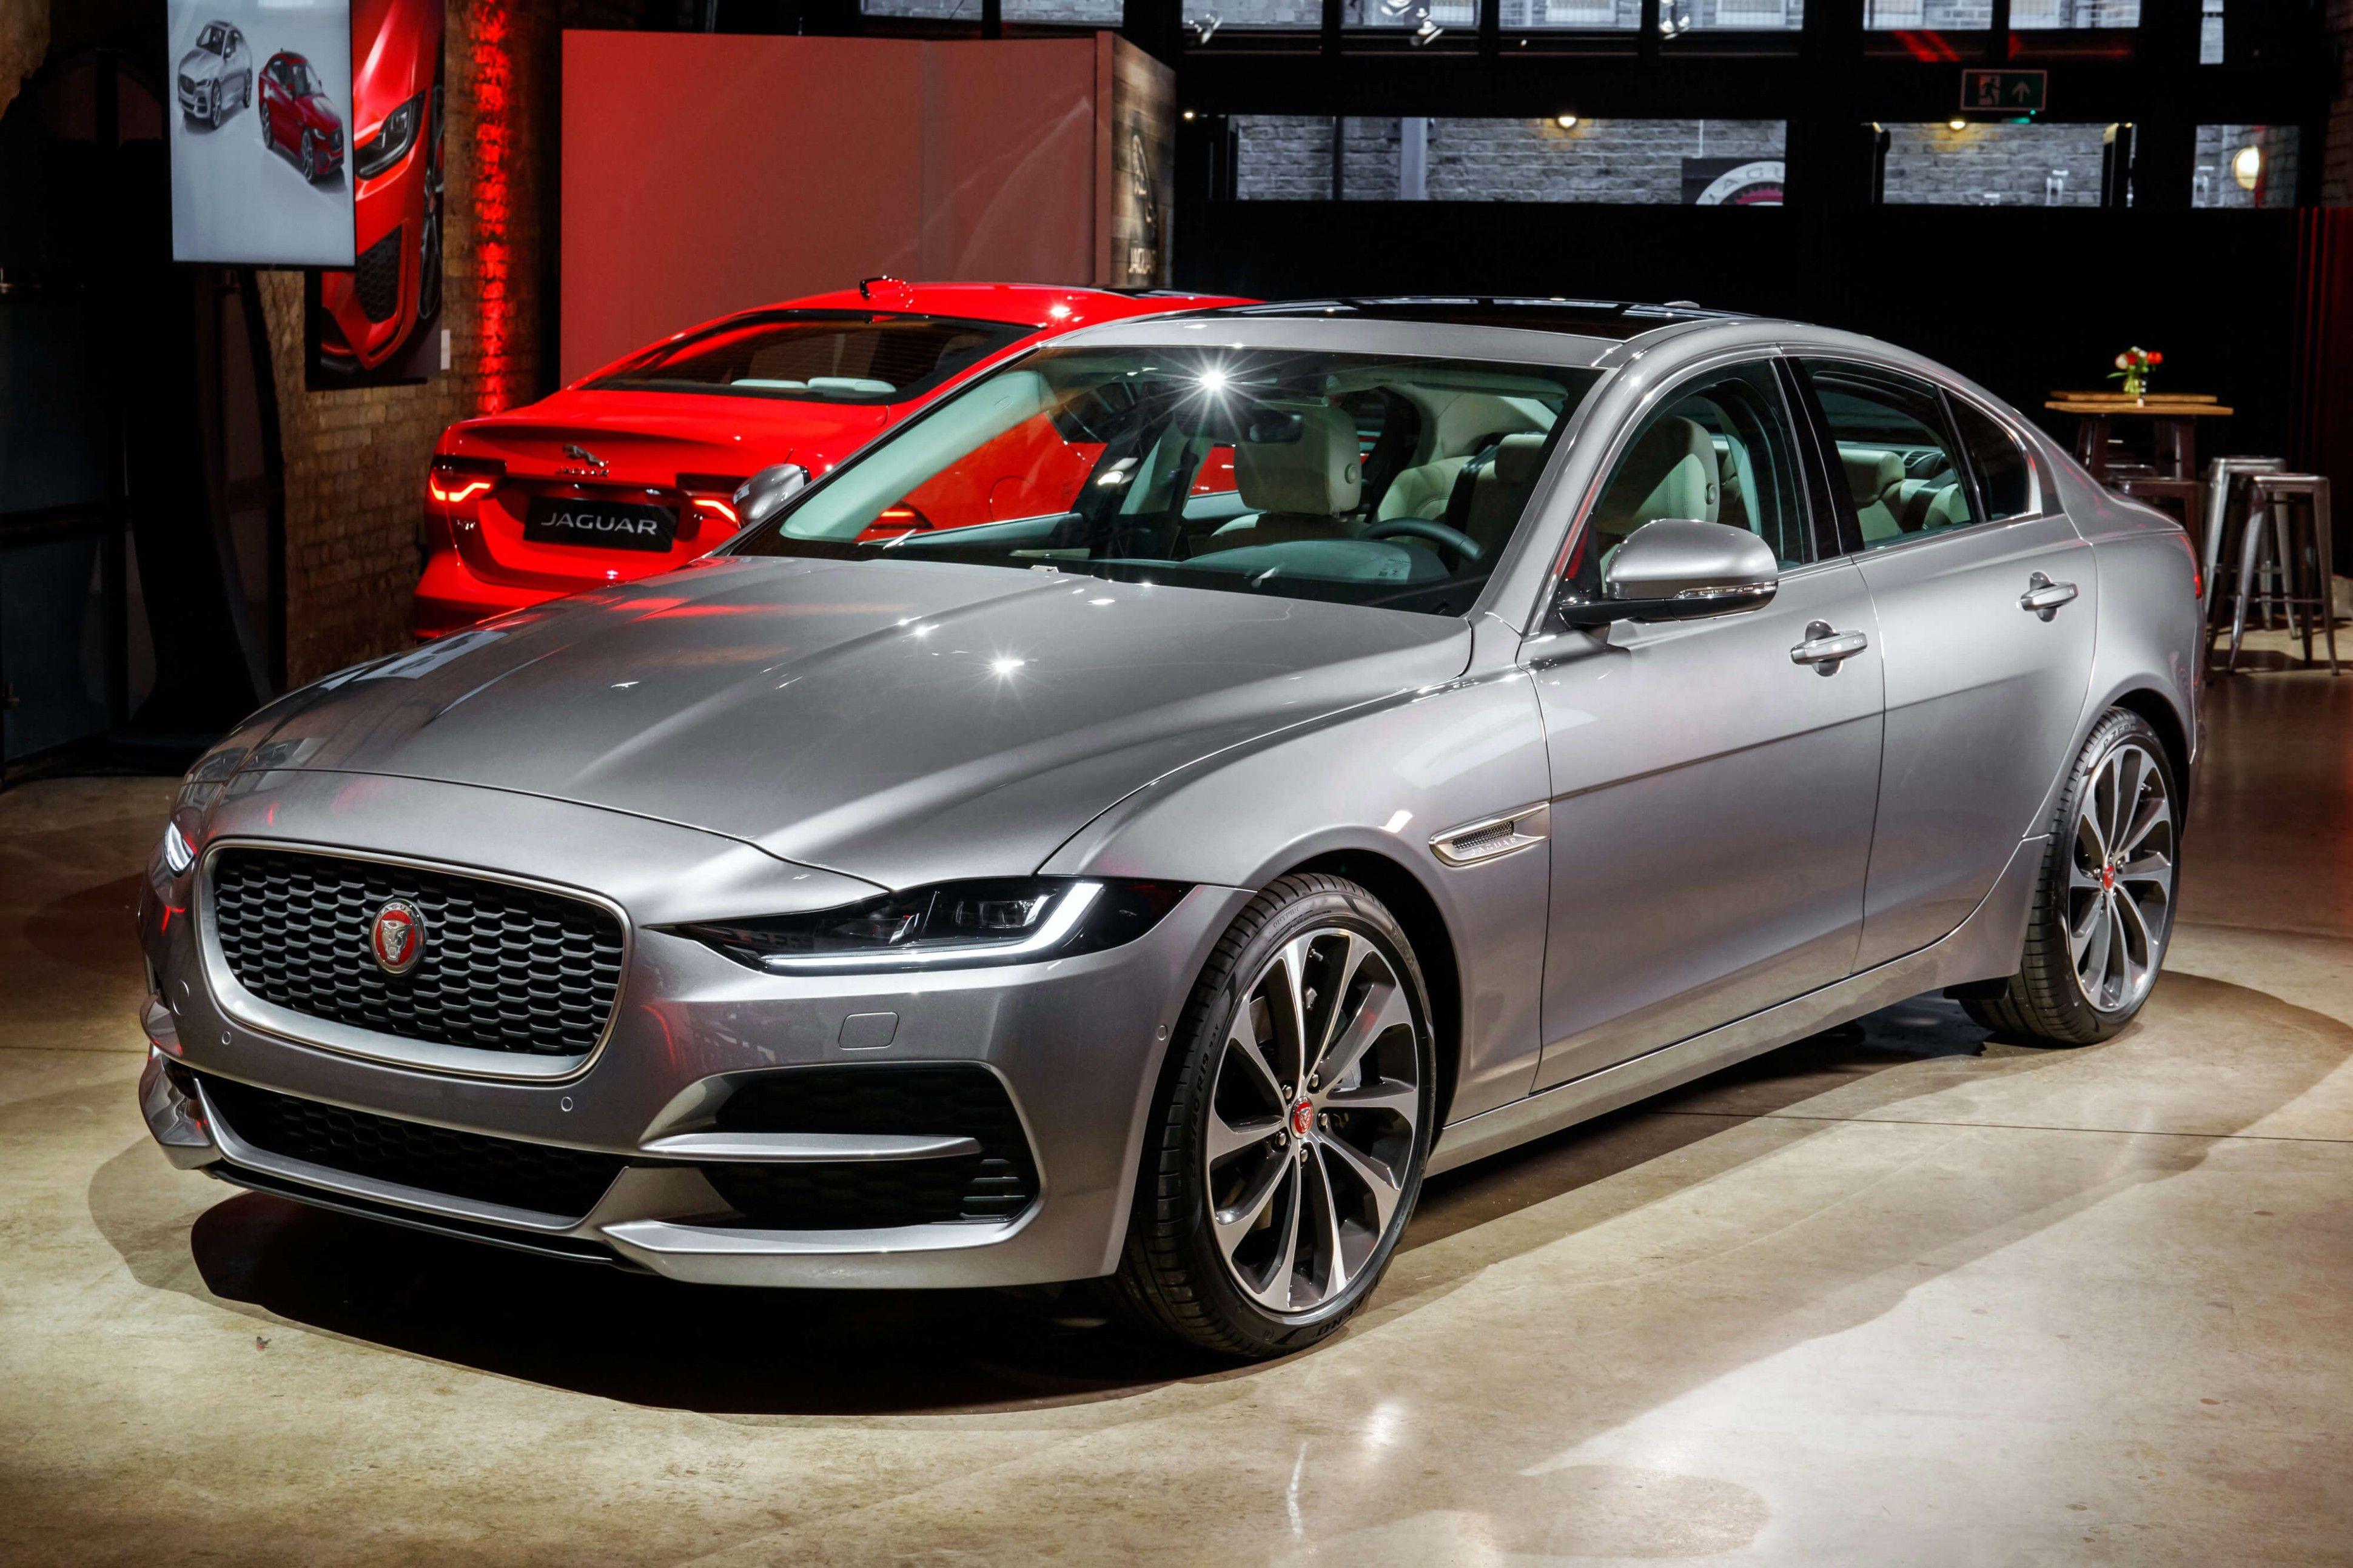 Jaguar New Xe 2020 Reviews